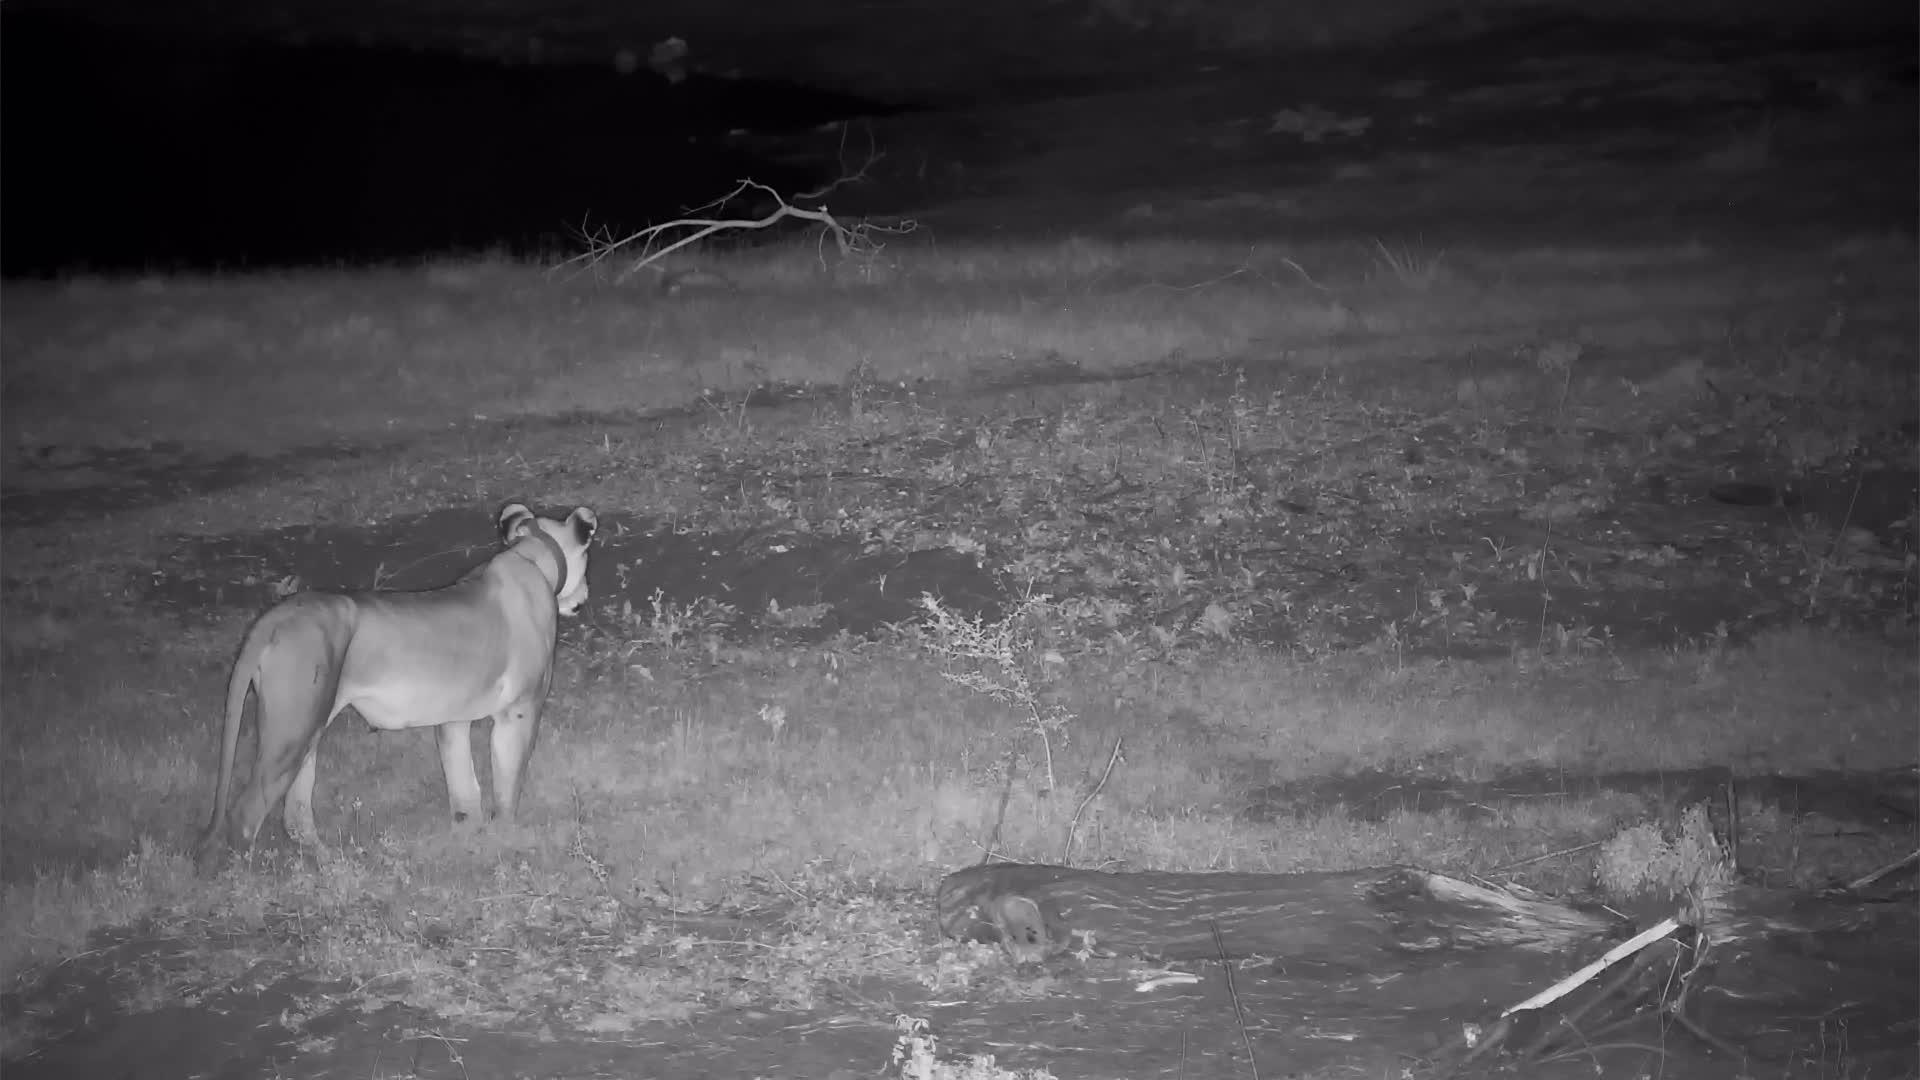 VIDEO: Lioness roars, looks around and slowly walks away